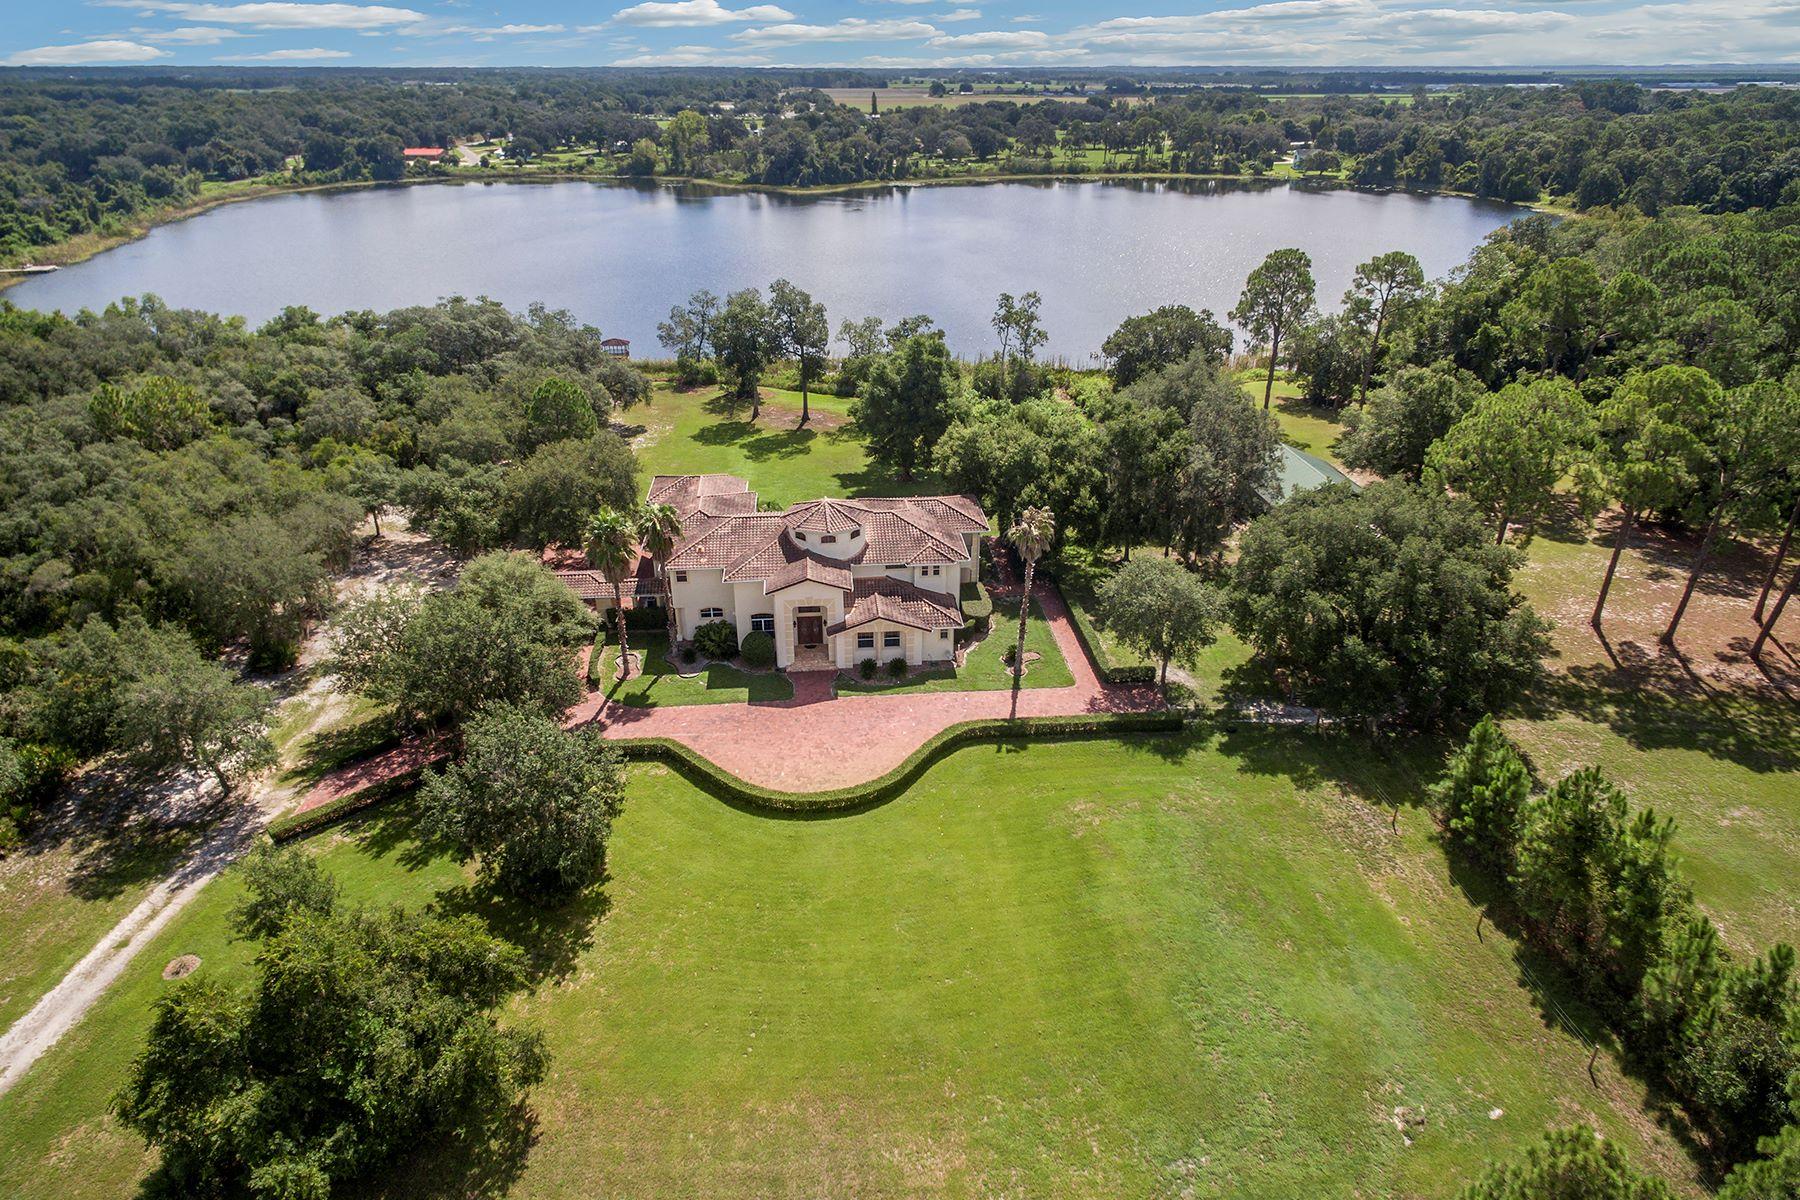 獨棟家庭住宅 為 出售 在 MOUNT DORA ORLANDO 27007 Lake Lena, Mount Dora, 佛羅里達州, 32757 美國